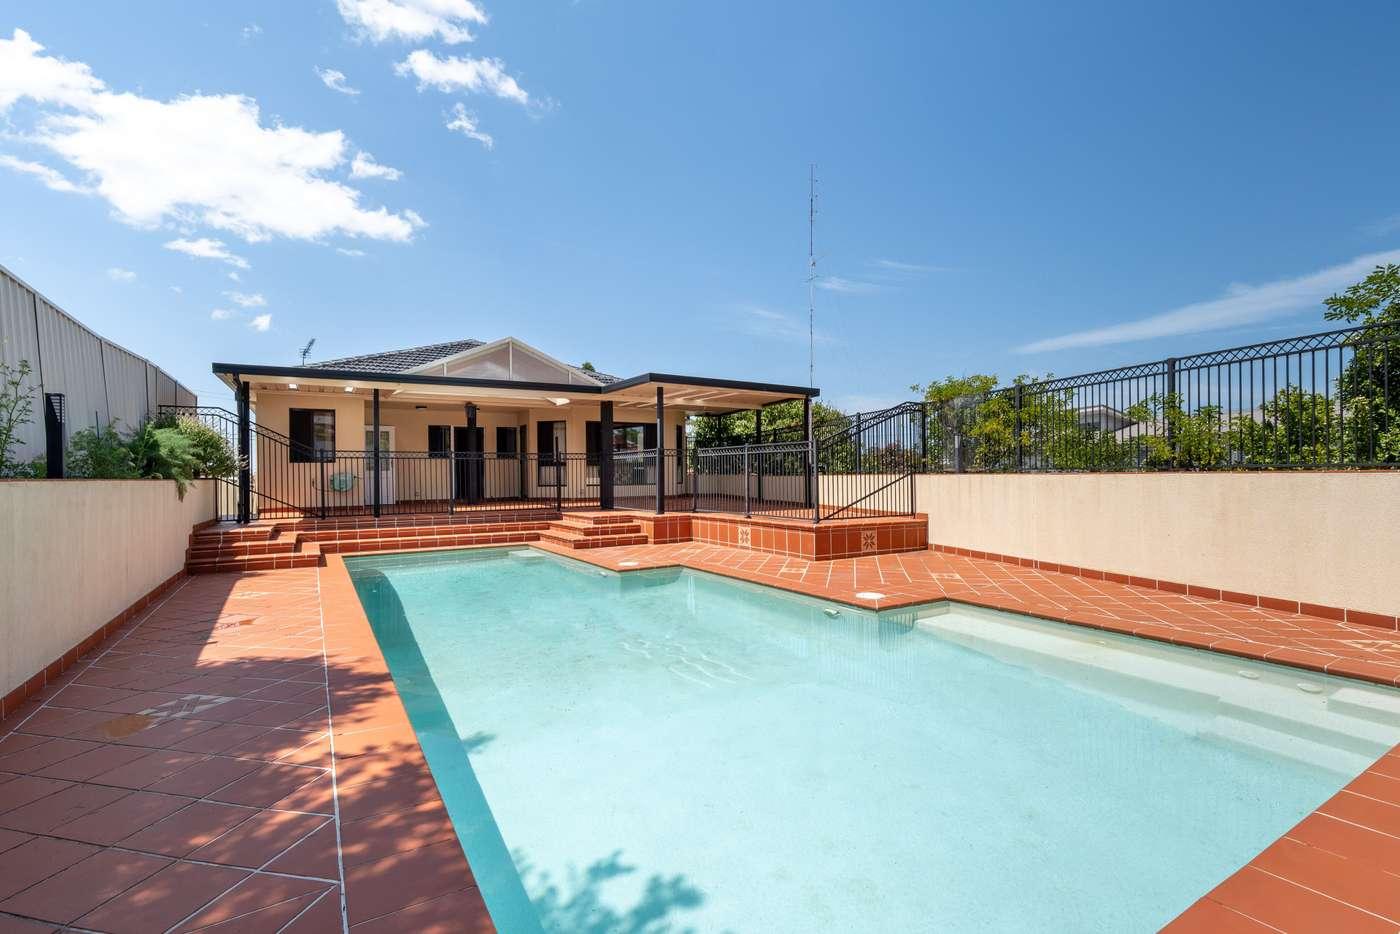 Main view of Homely house listing, 28 Grainger Street, Lambton NSW 2299